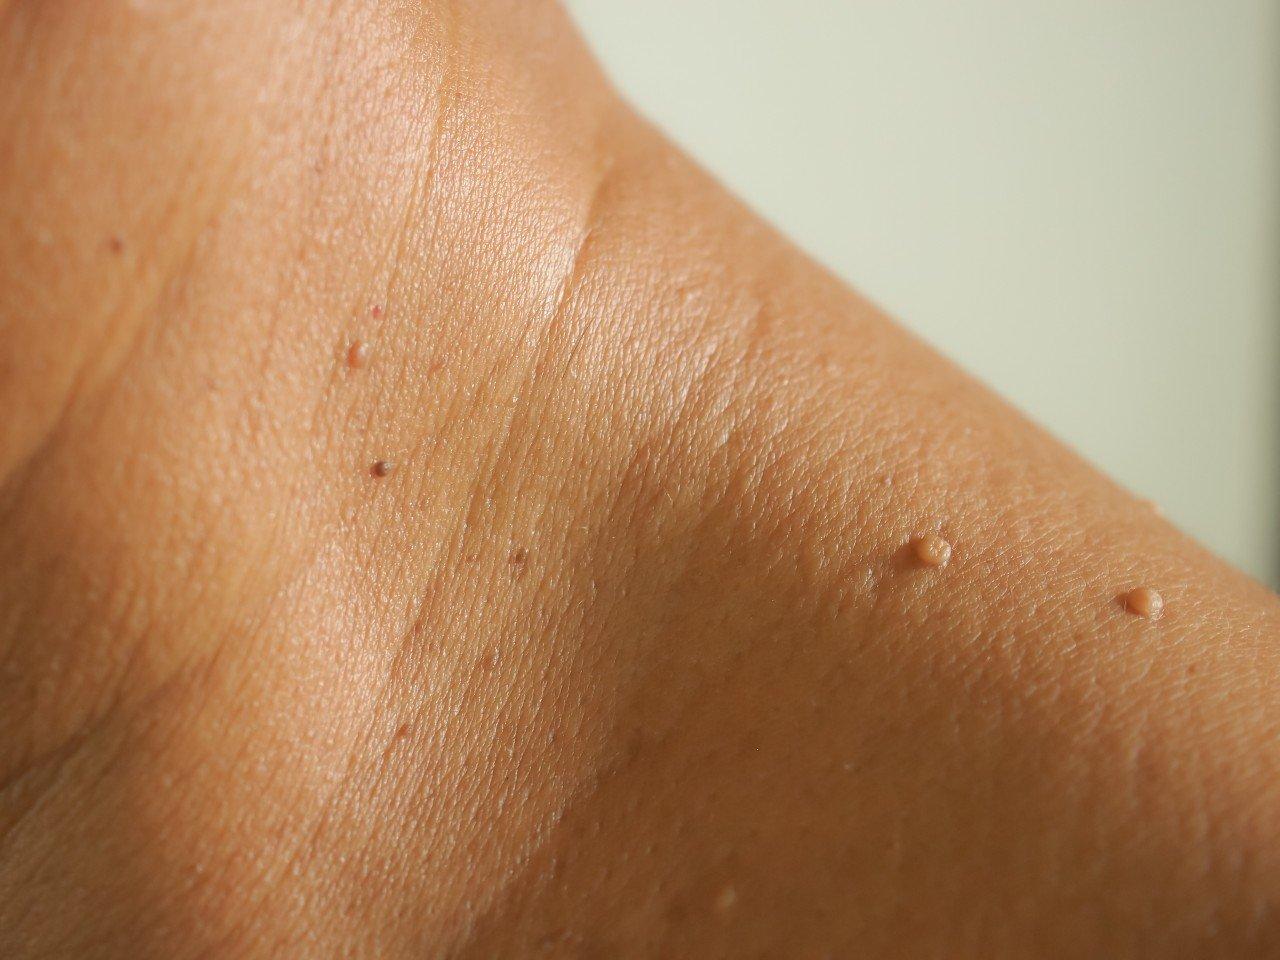 skin-tag-removal-miami (1)